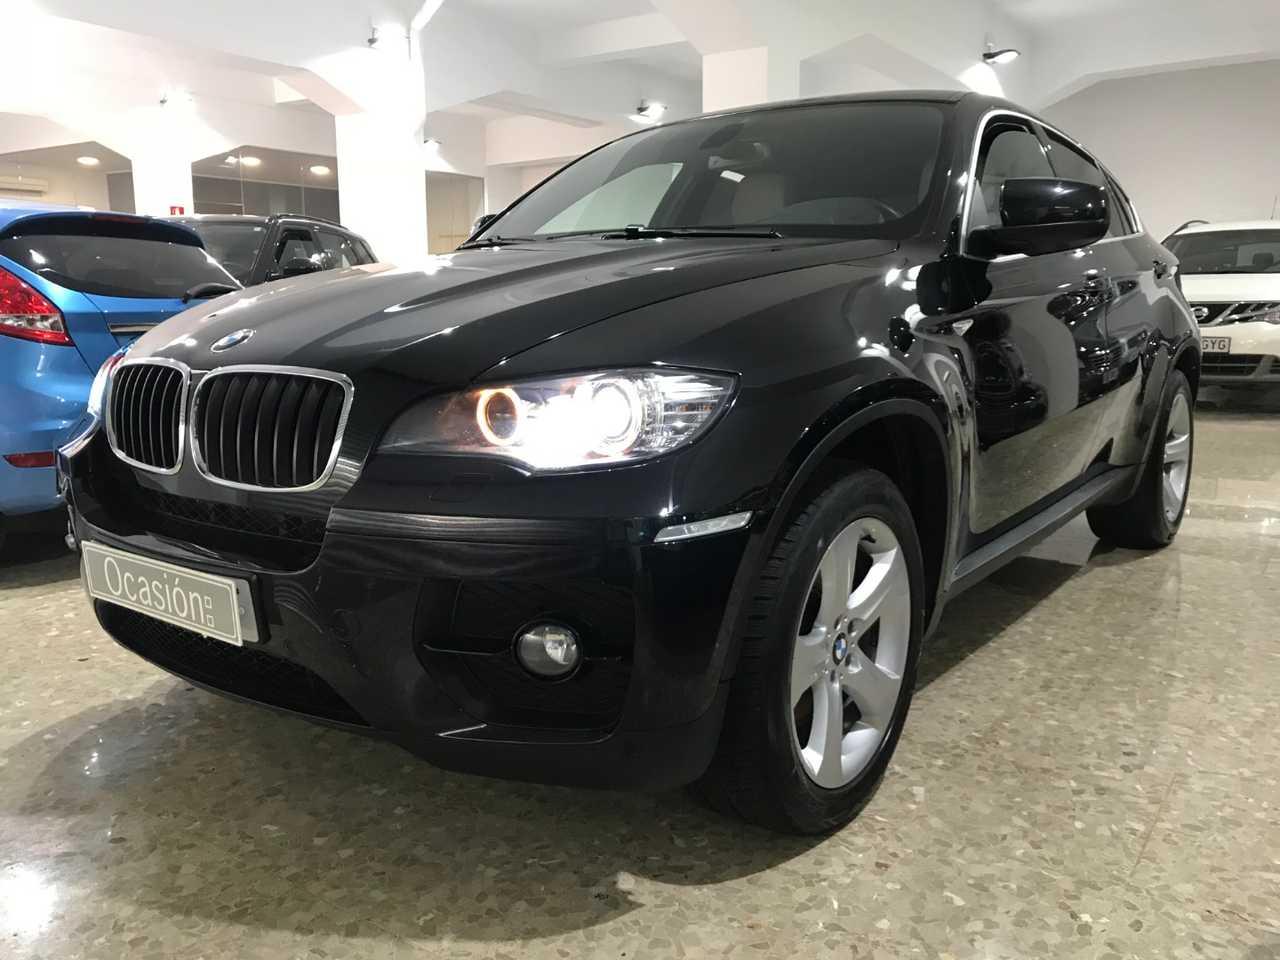 BMW X6 4.0D 5 PLAZAS 306CV   - Foto 1